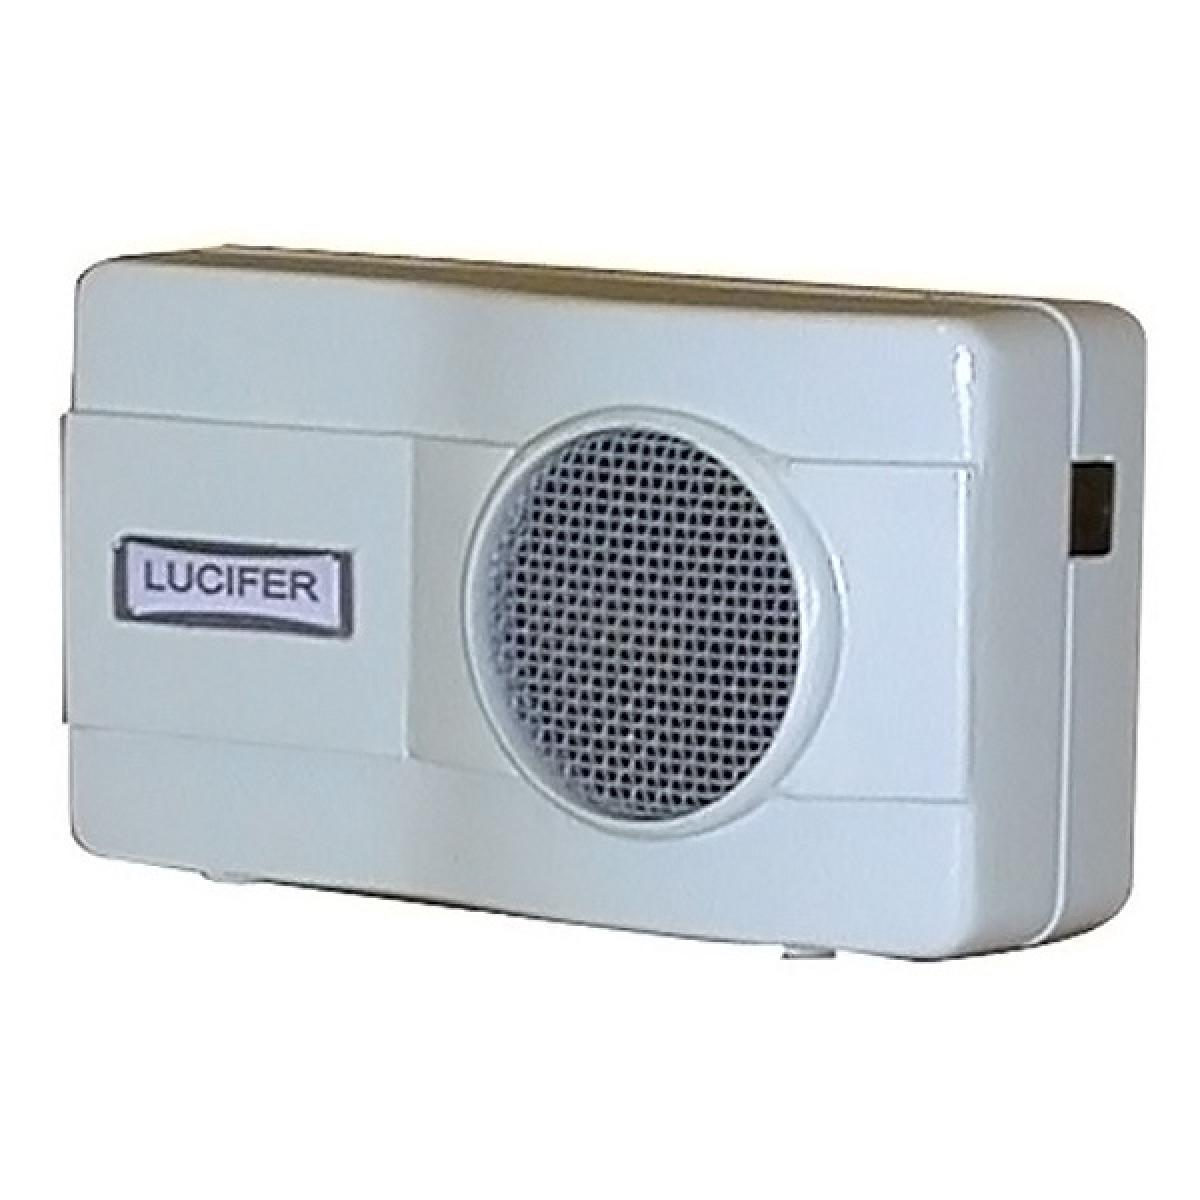 Lucifer lucifer - 65